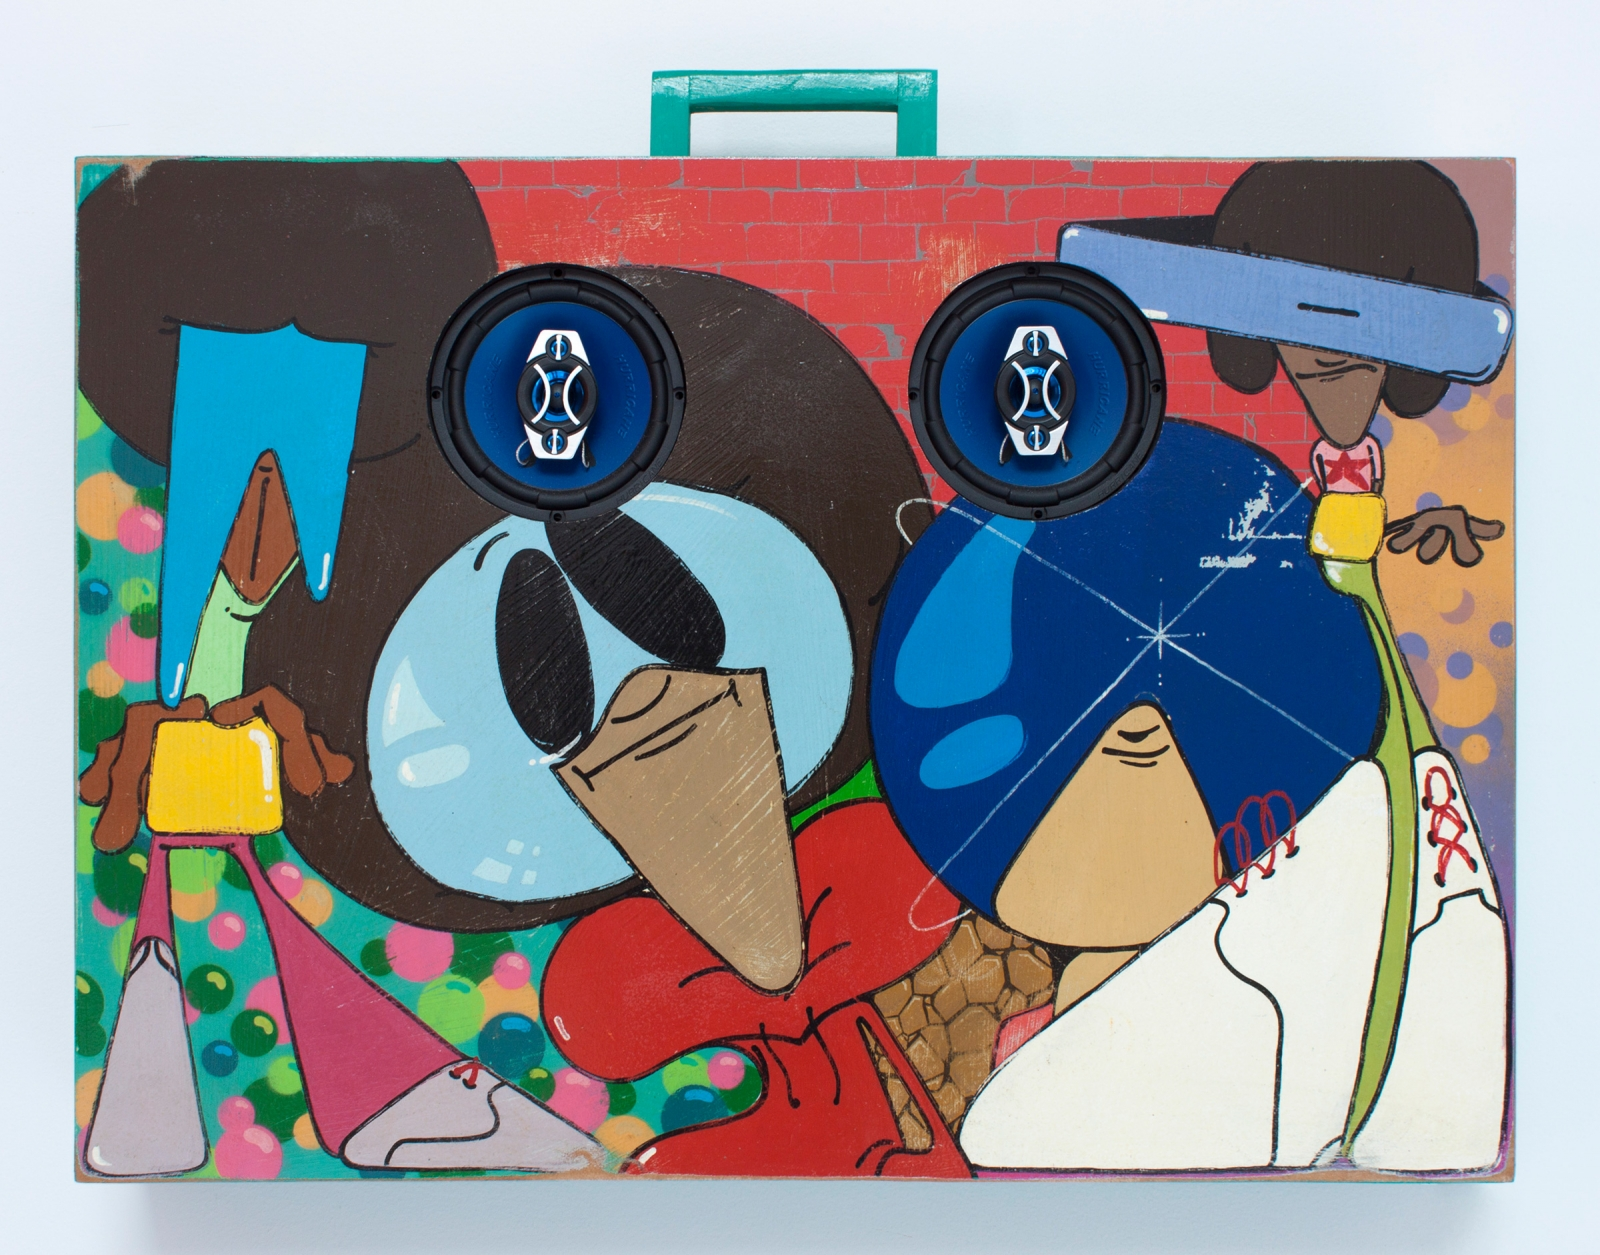 OSGEMEOS, Glass, 2016